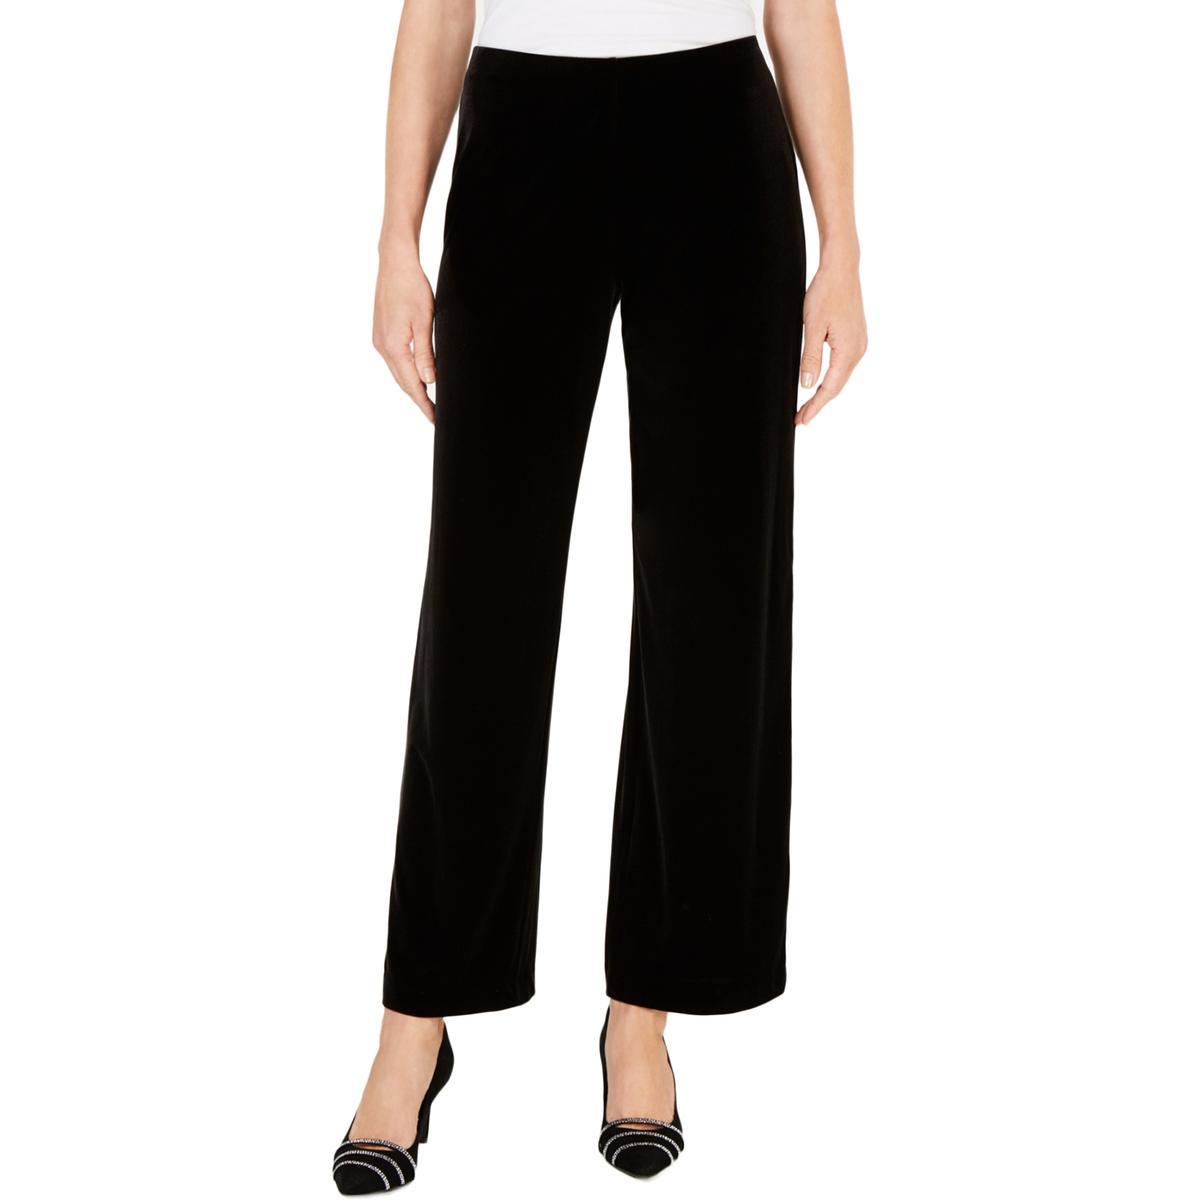 Alfani Womens Black Velvet Ombre Night Out Wide Leg Pants Plus 1X BHFO 1071